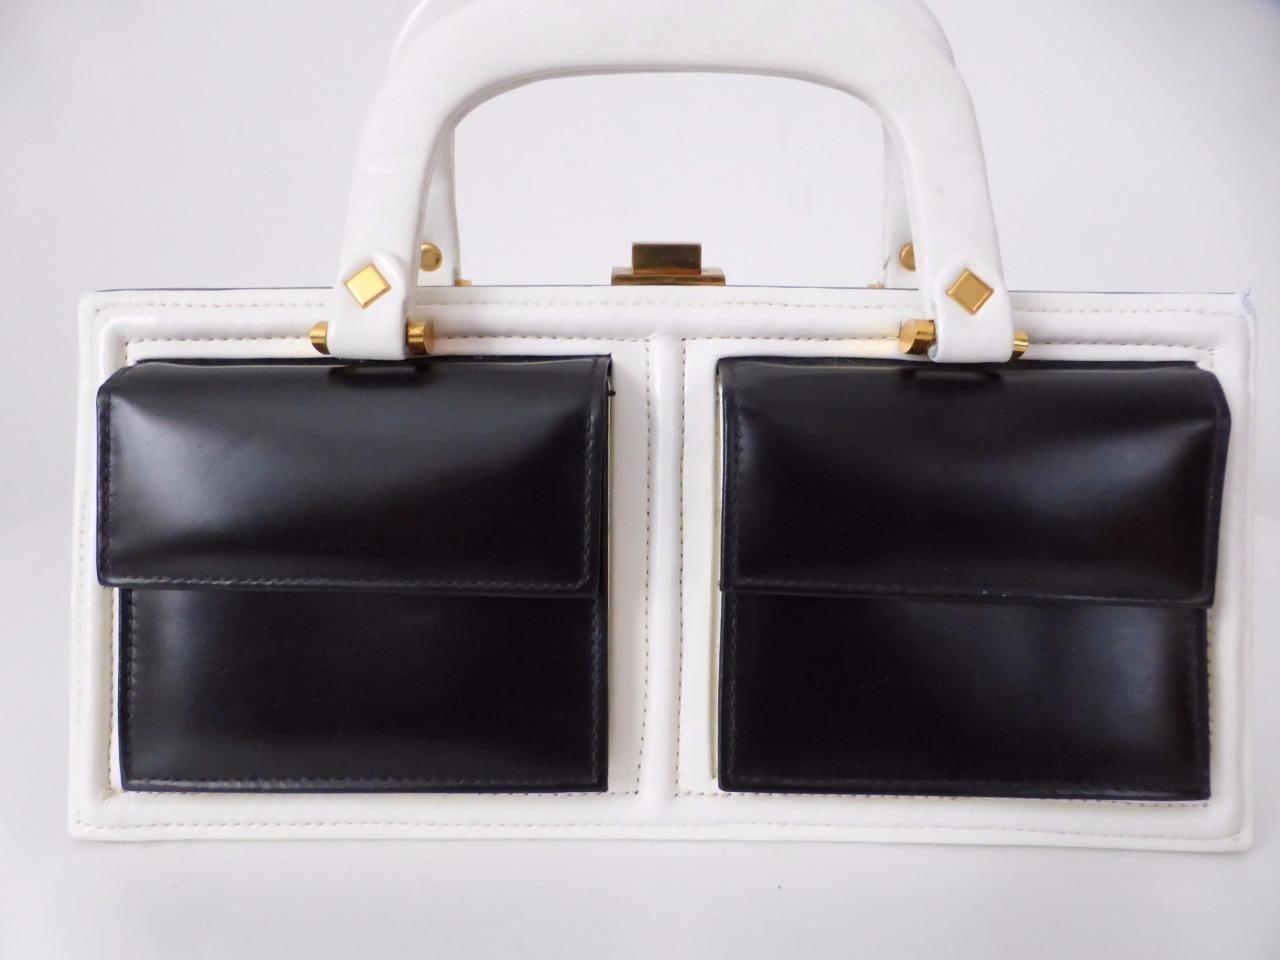 Hollywood Handbags Sydney Australia Rare Vintage Black And White Leather Handbag Ebay